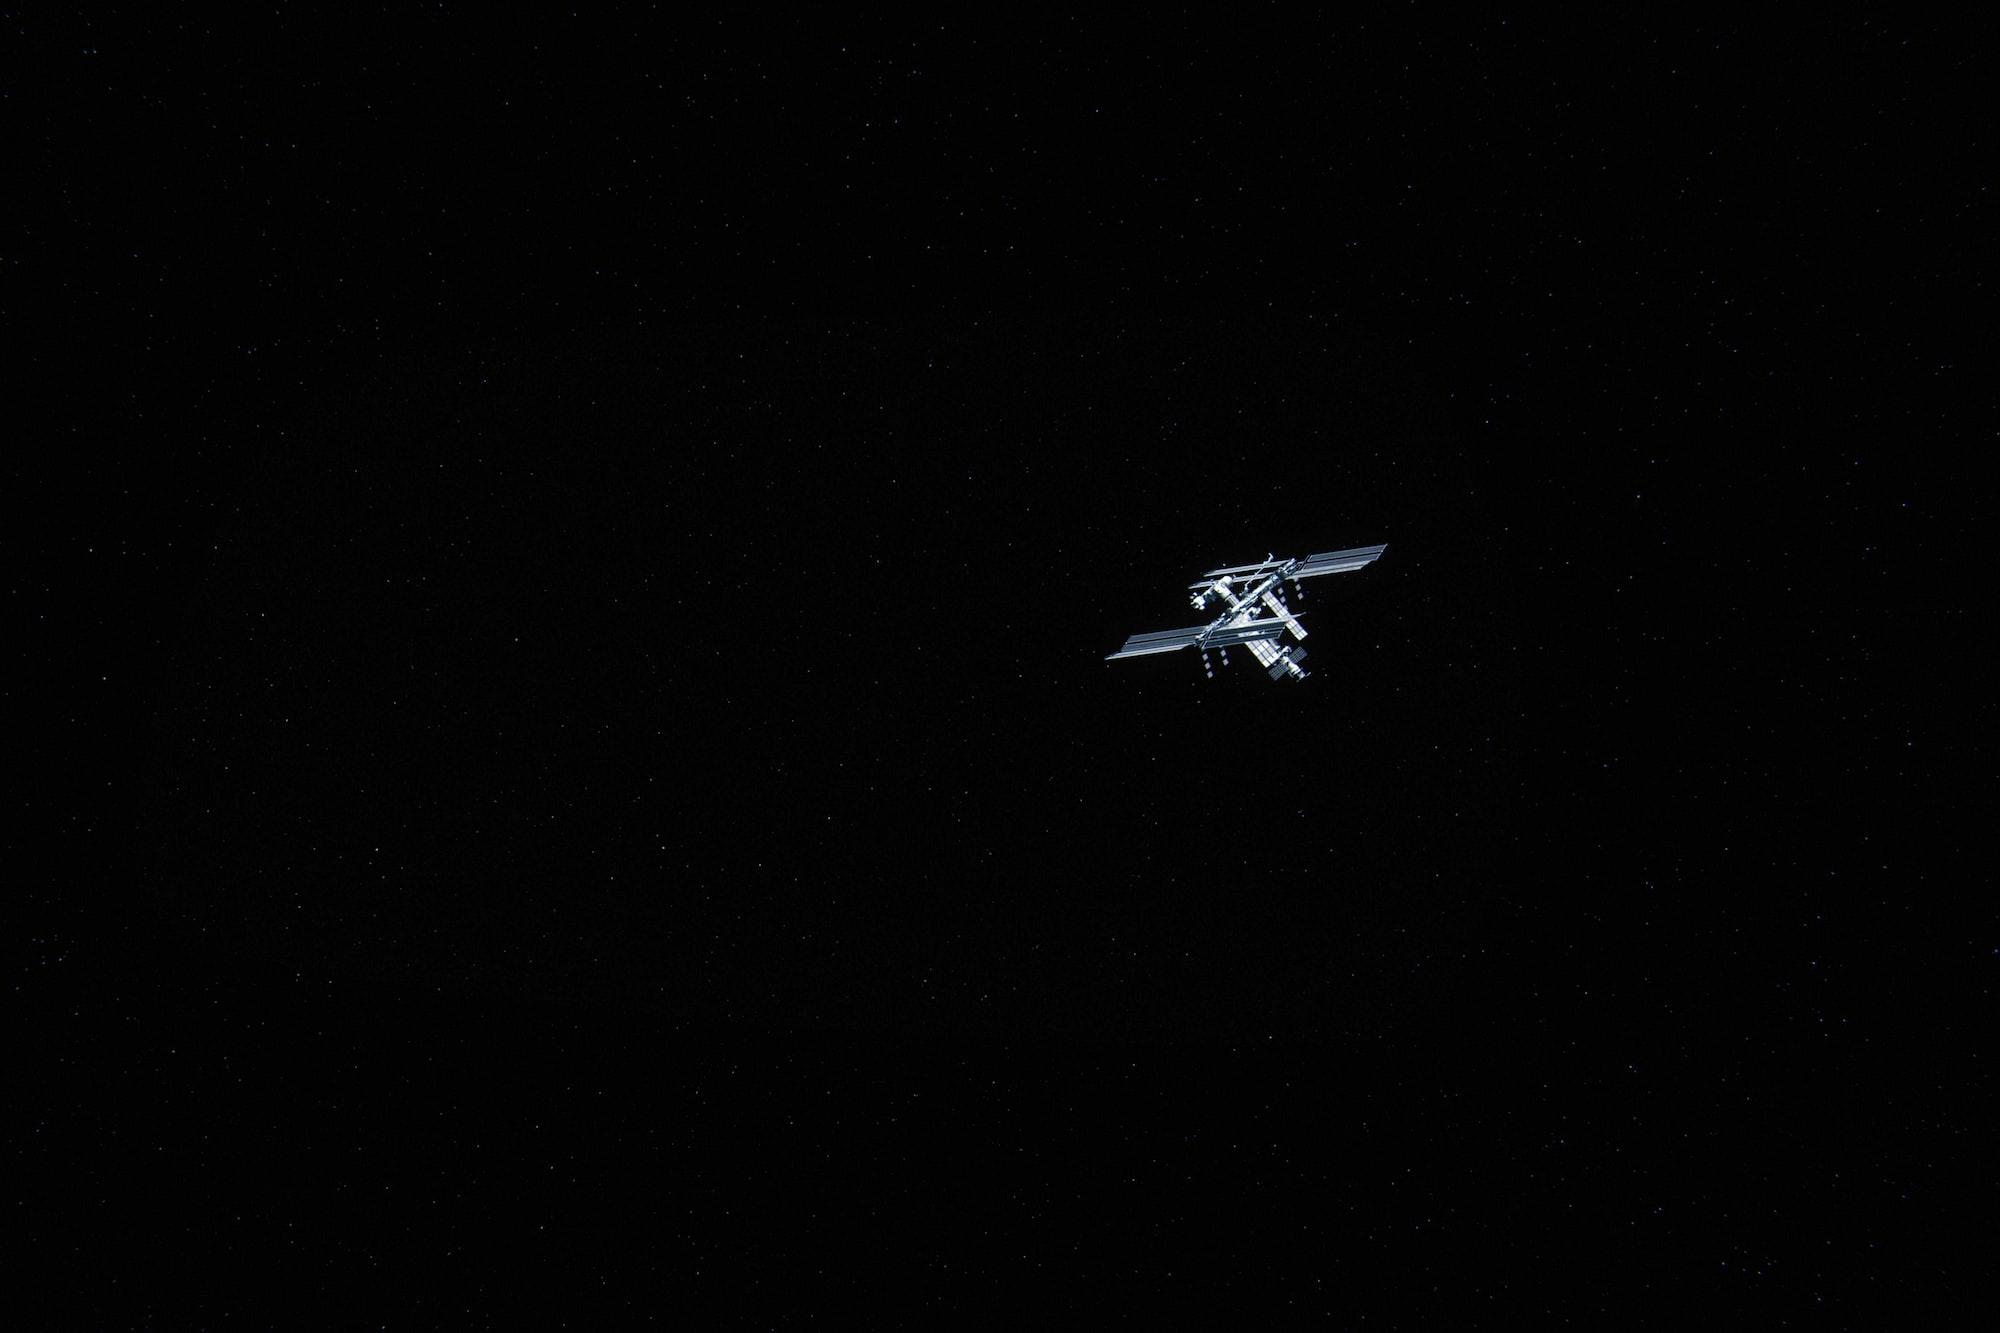 ISS International Space Station SSTV